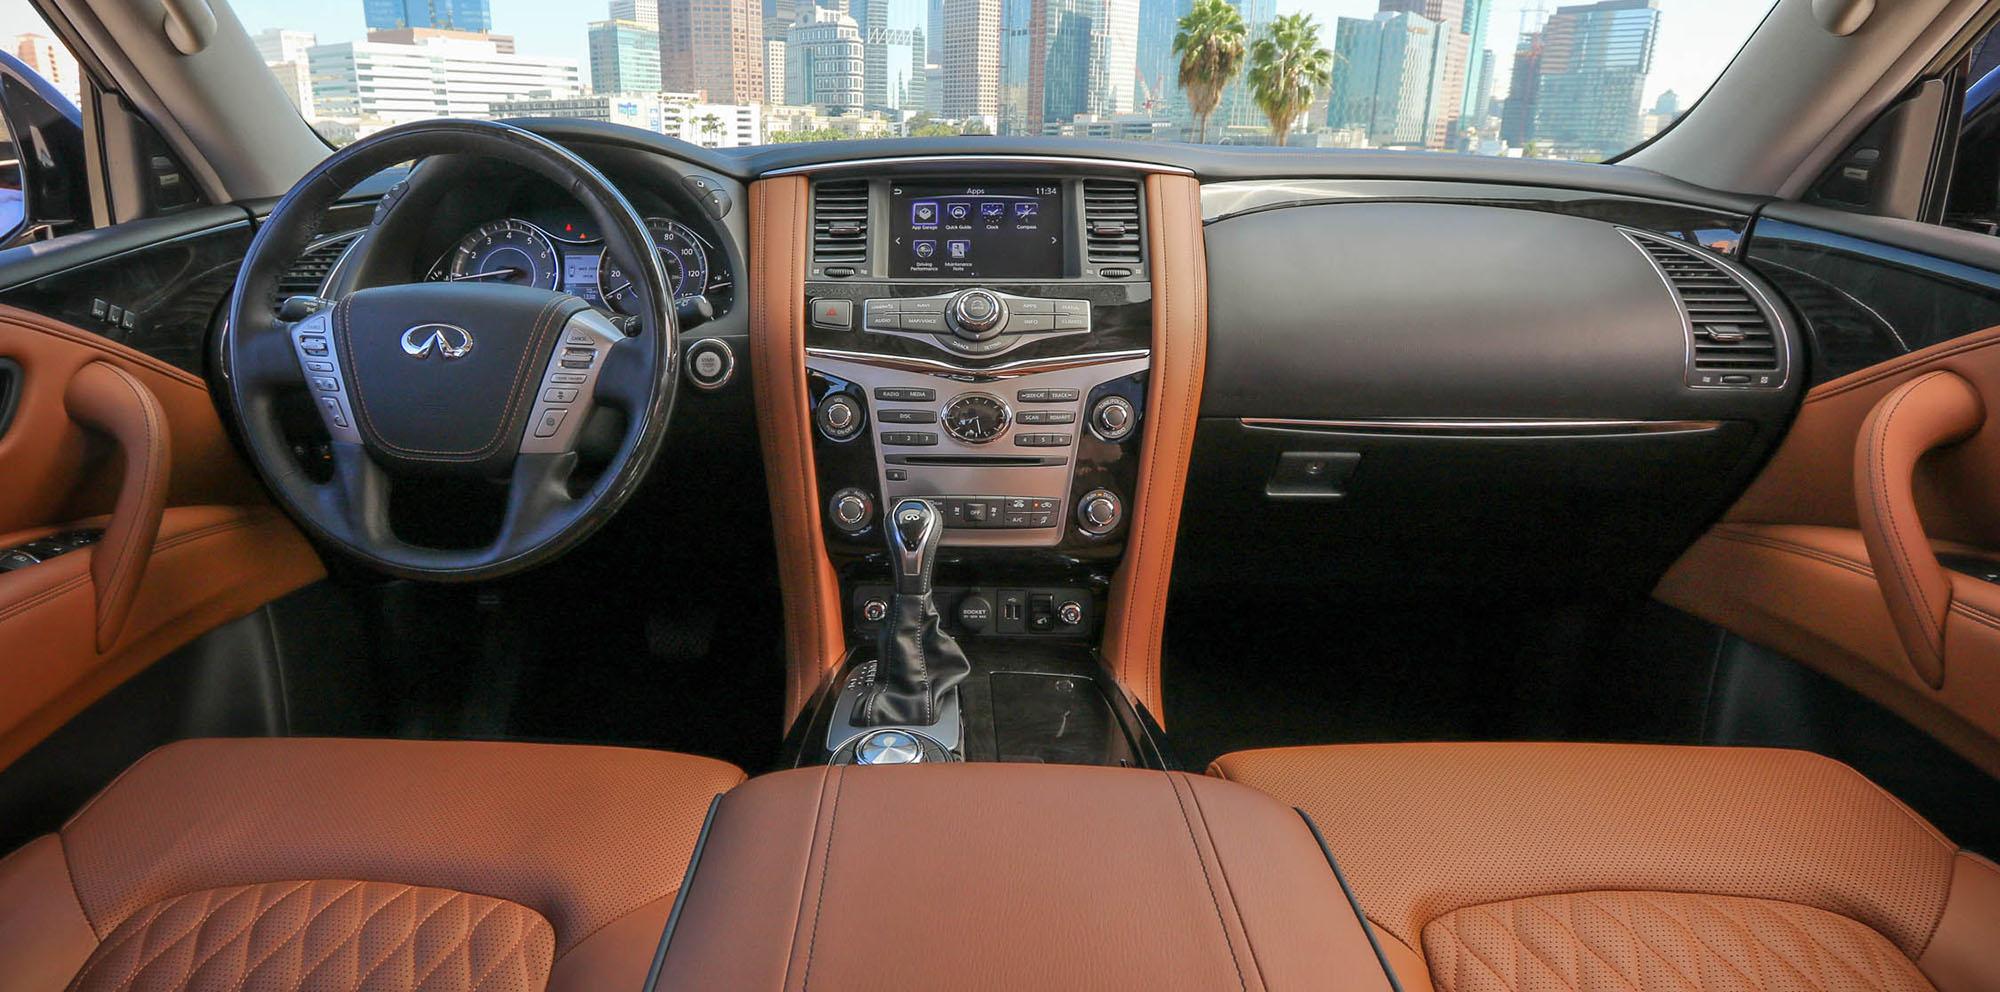 2018 Infiniti QX80 facelift unveiled ahead of Dubai show ...